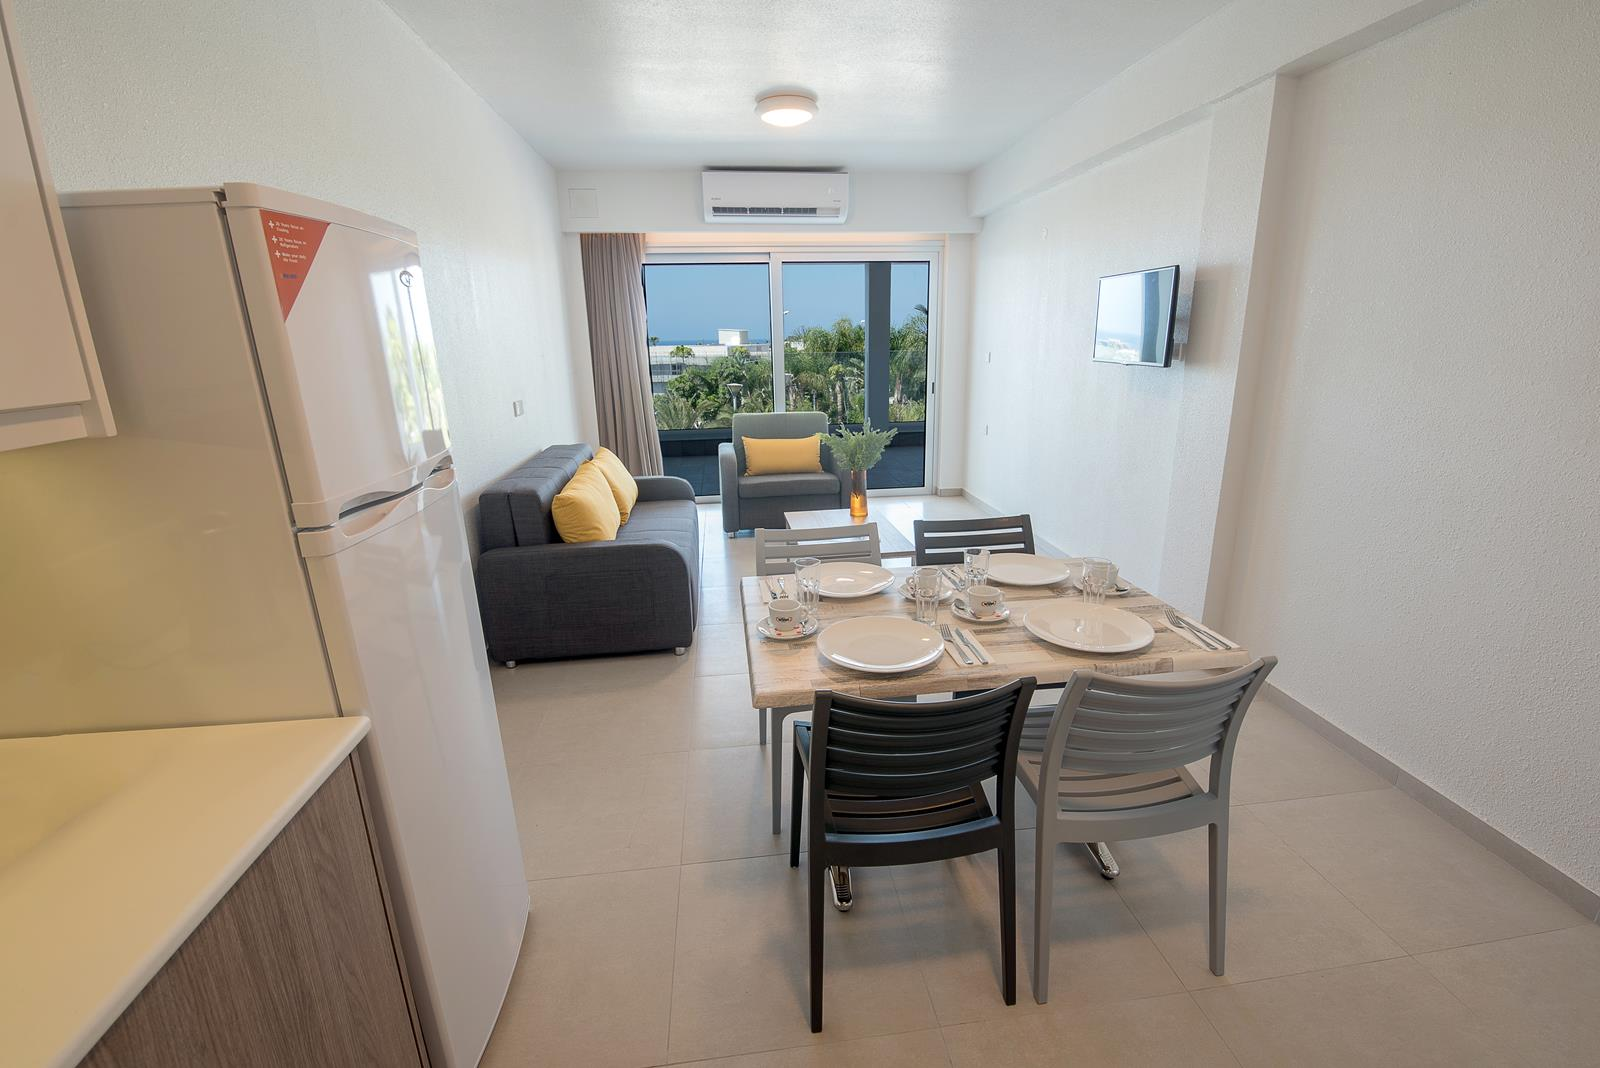 apartments ayia napa Cyprus - La Casa Di Napa